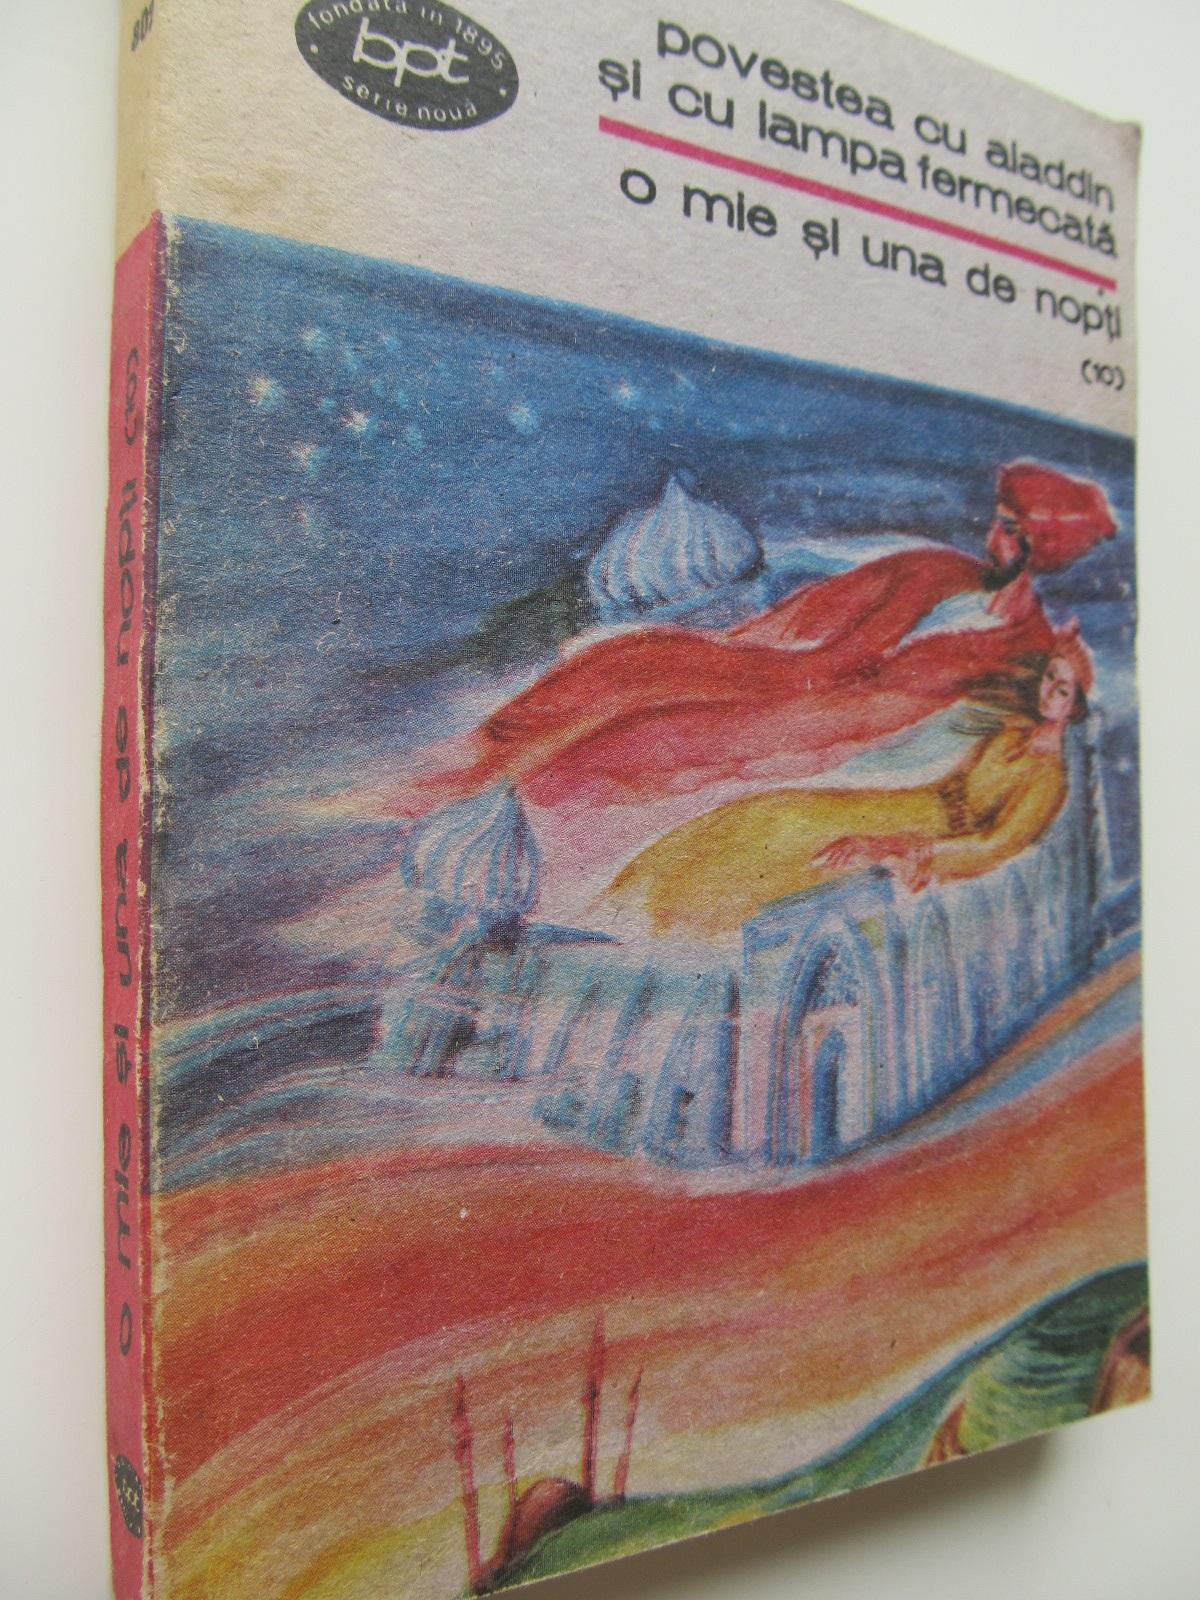 Povestea cu Aladdin si cu lampa fermecata - 1001 nopti (10) - *** | Detalii carte